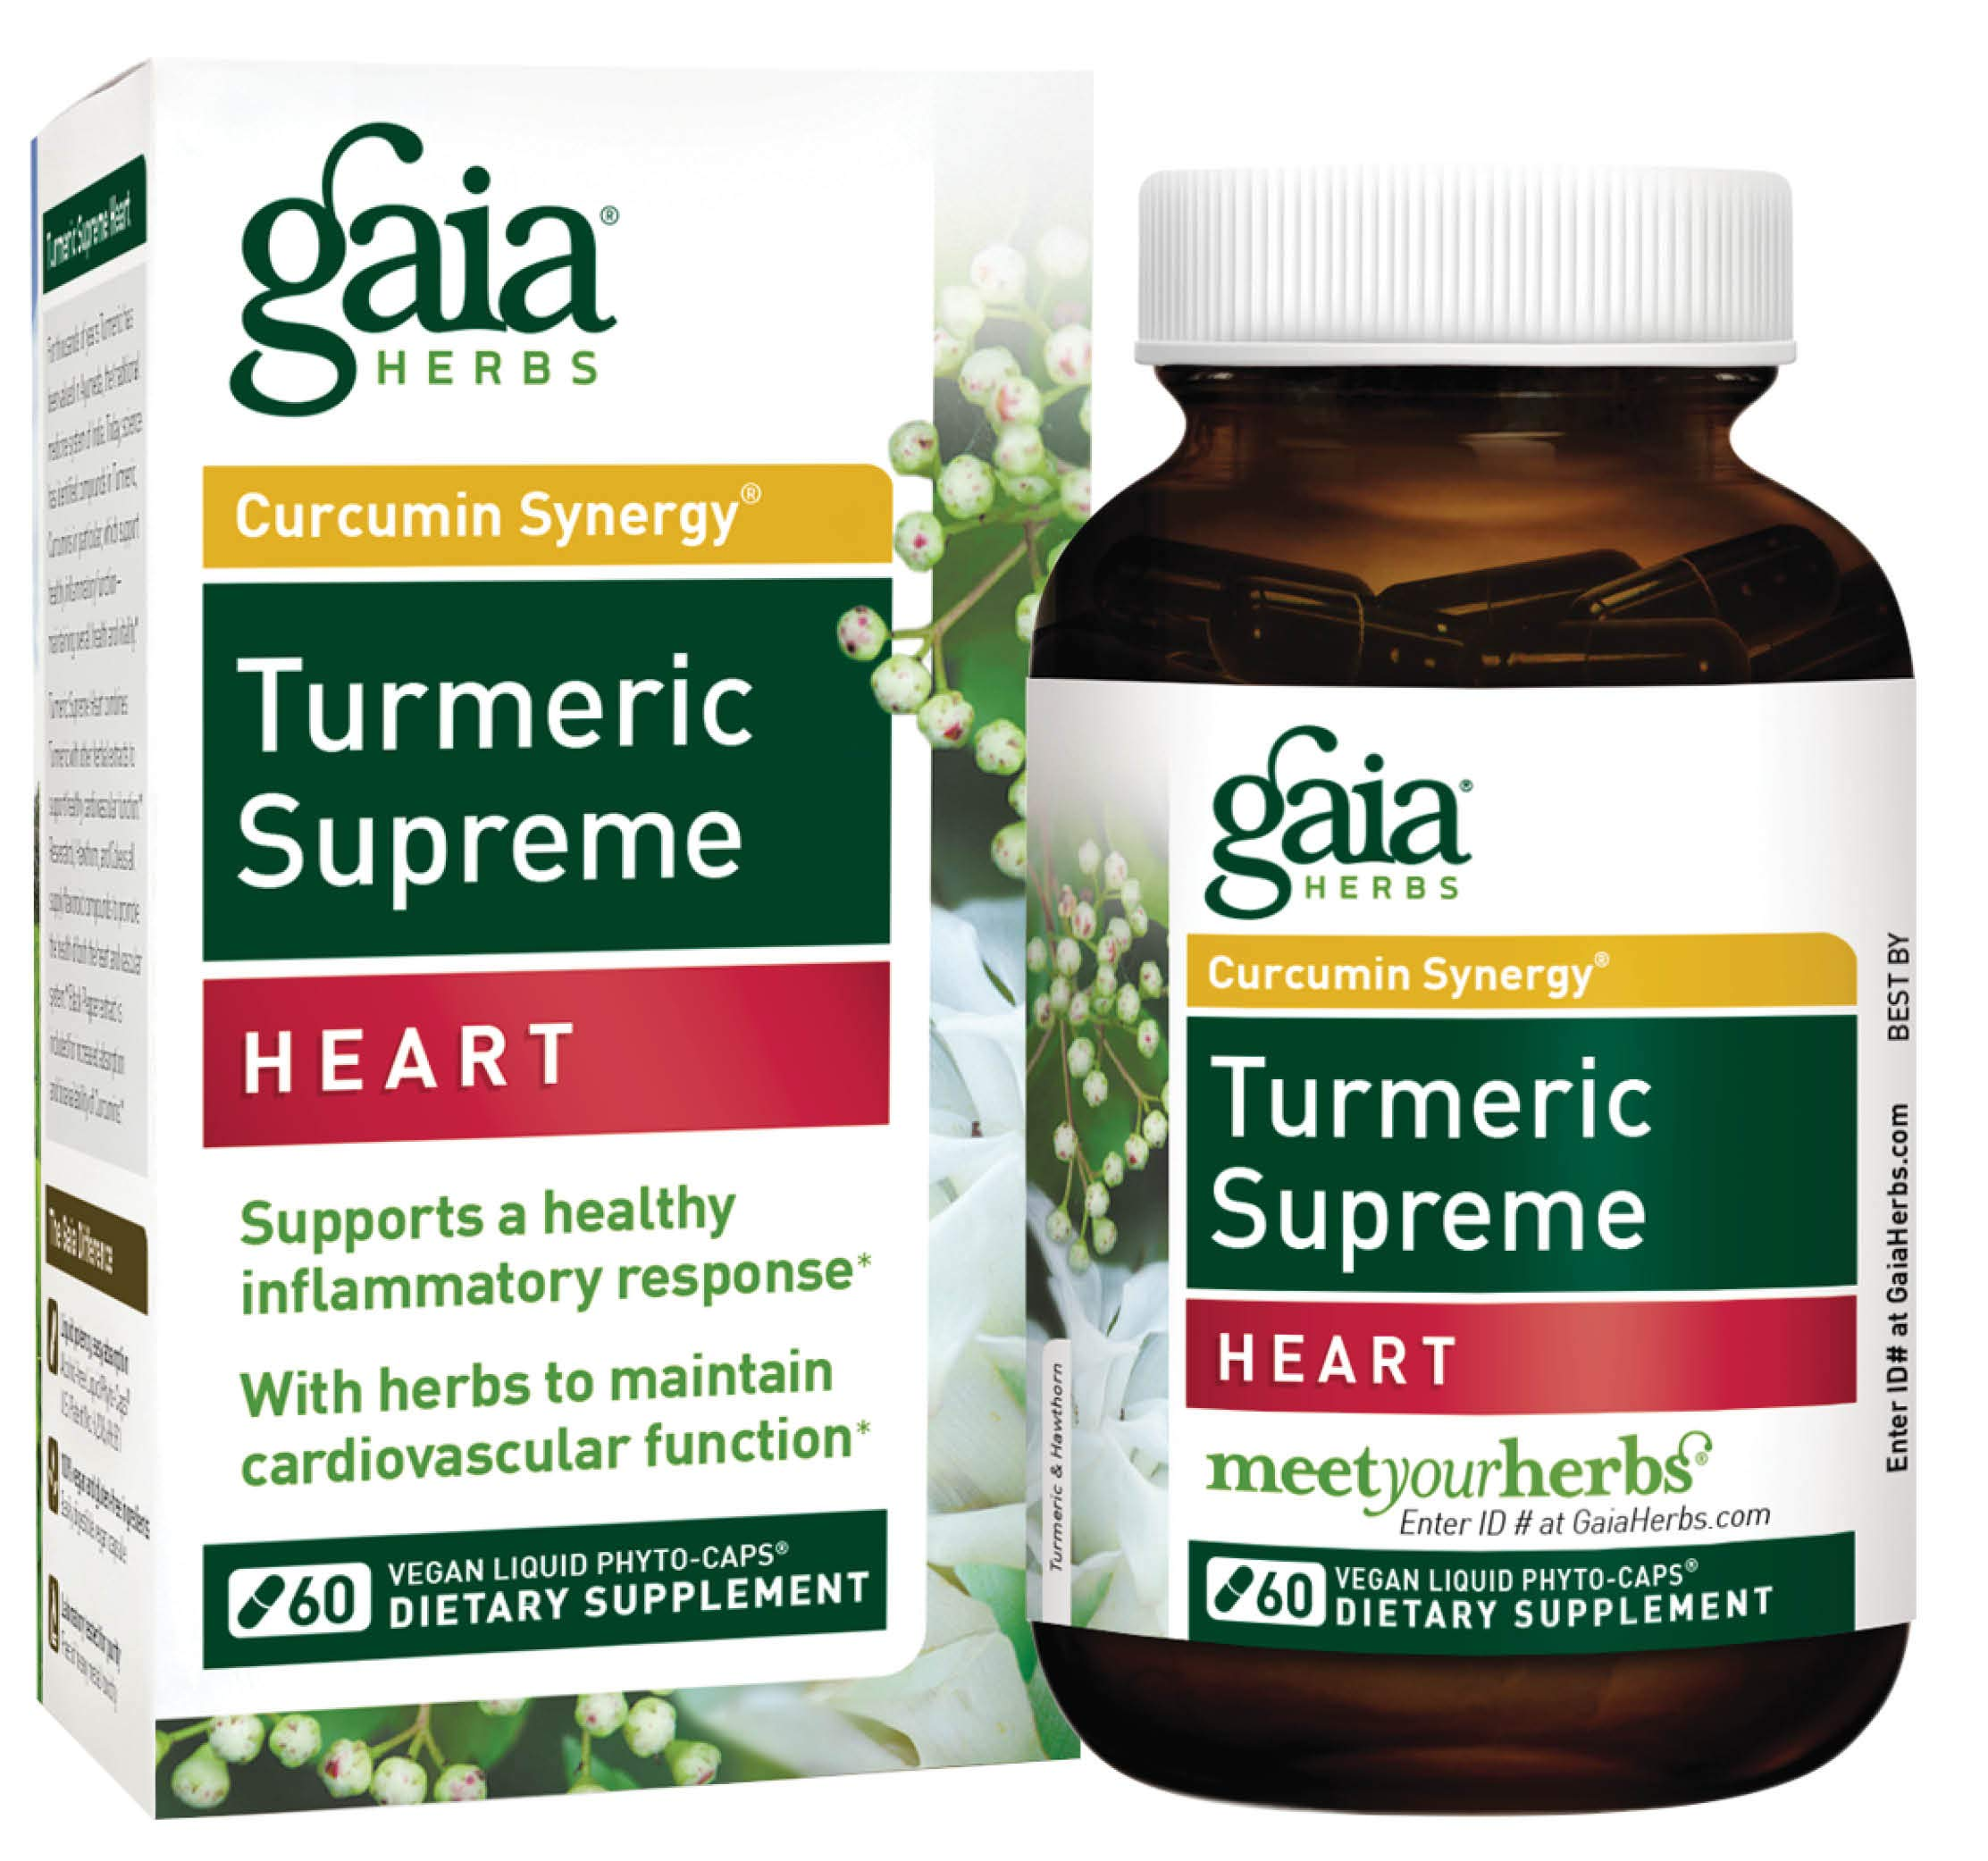 Gaia Herbs Turmeric Supreme Heart, Vegan Liquid Capsules, 60 Count - Turmeric Curcumin Supplement Promotes Heart Health, with Black Pepper, Resveratrol, Quercitin, Organic Hawthorn